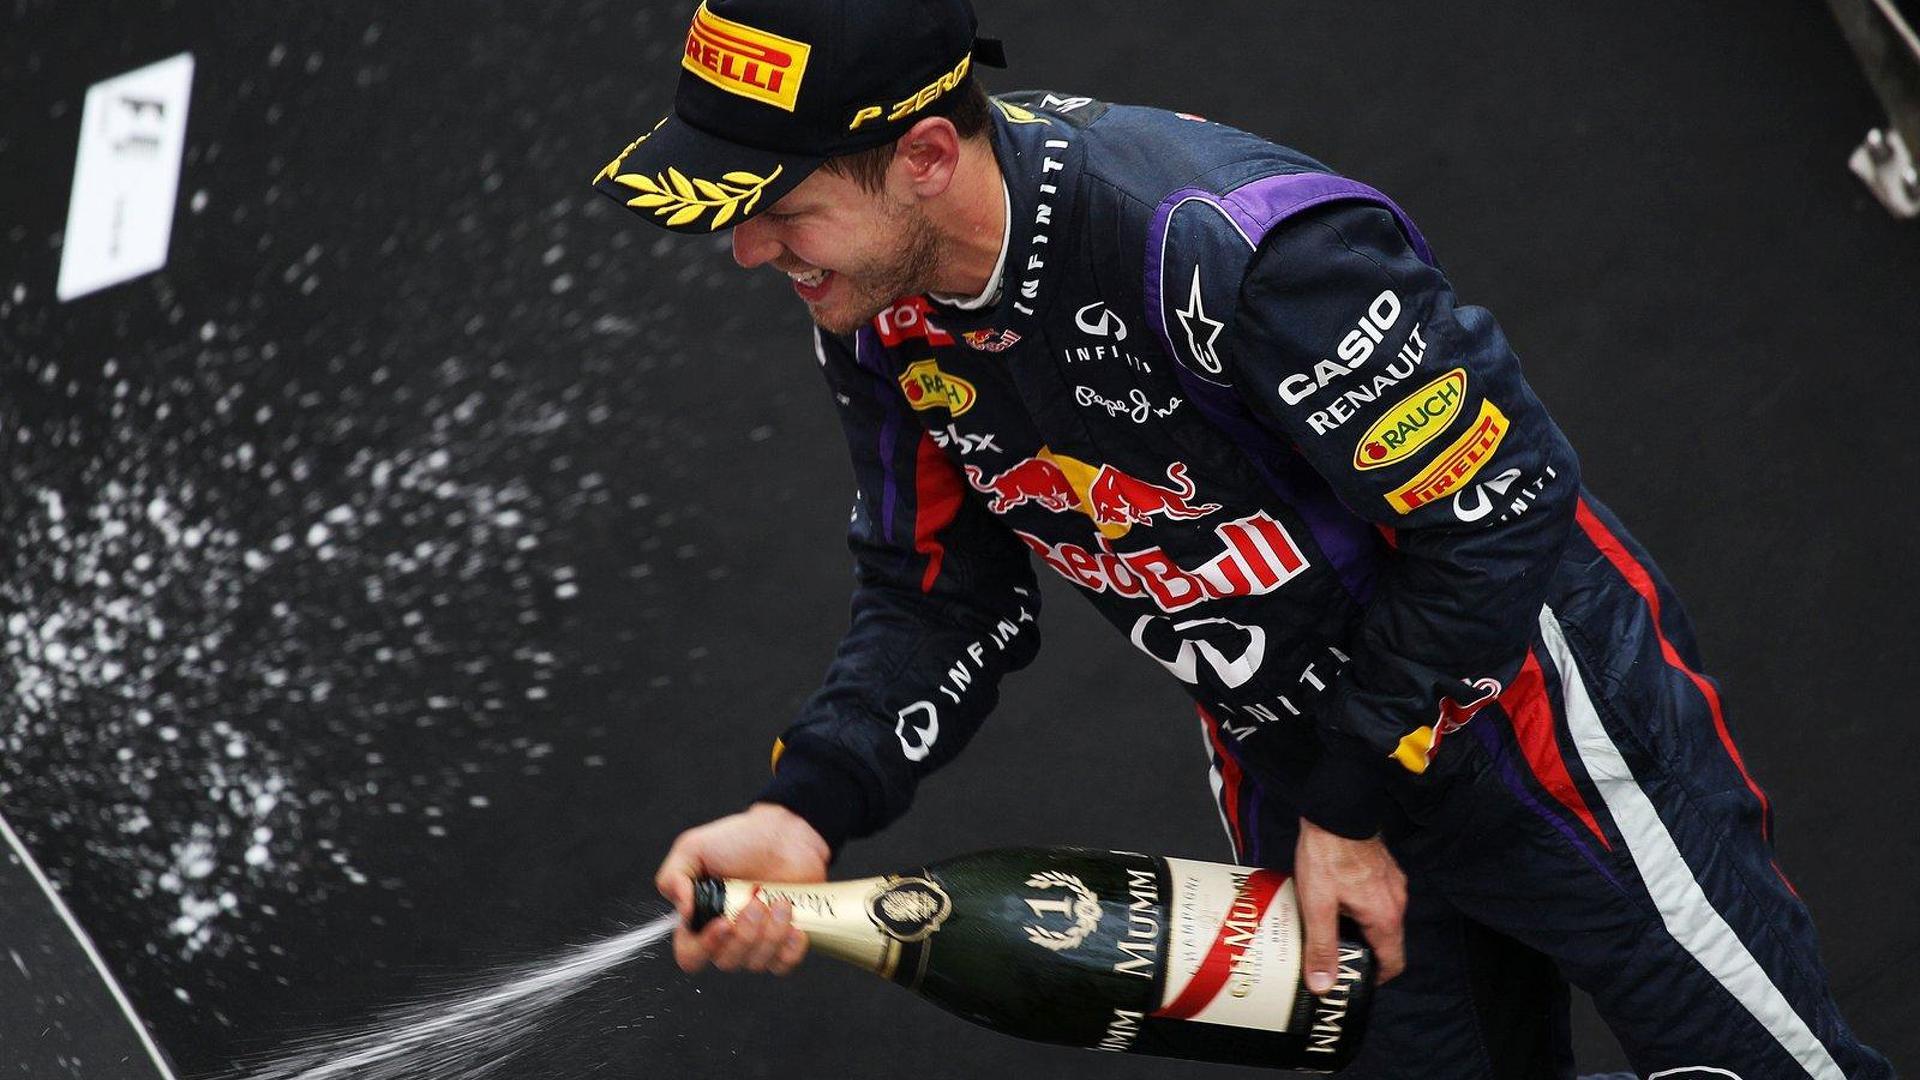 'No sense' in Vettel cheat claims - Renault